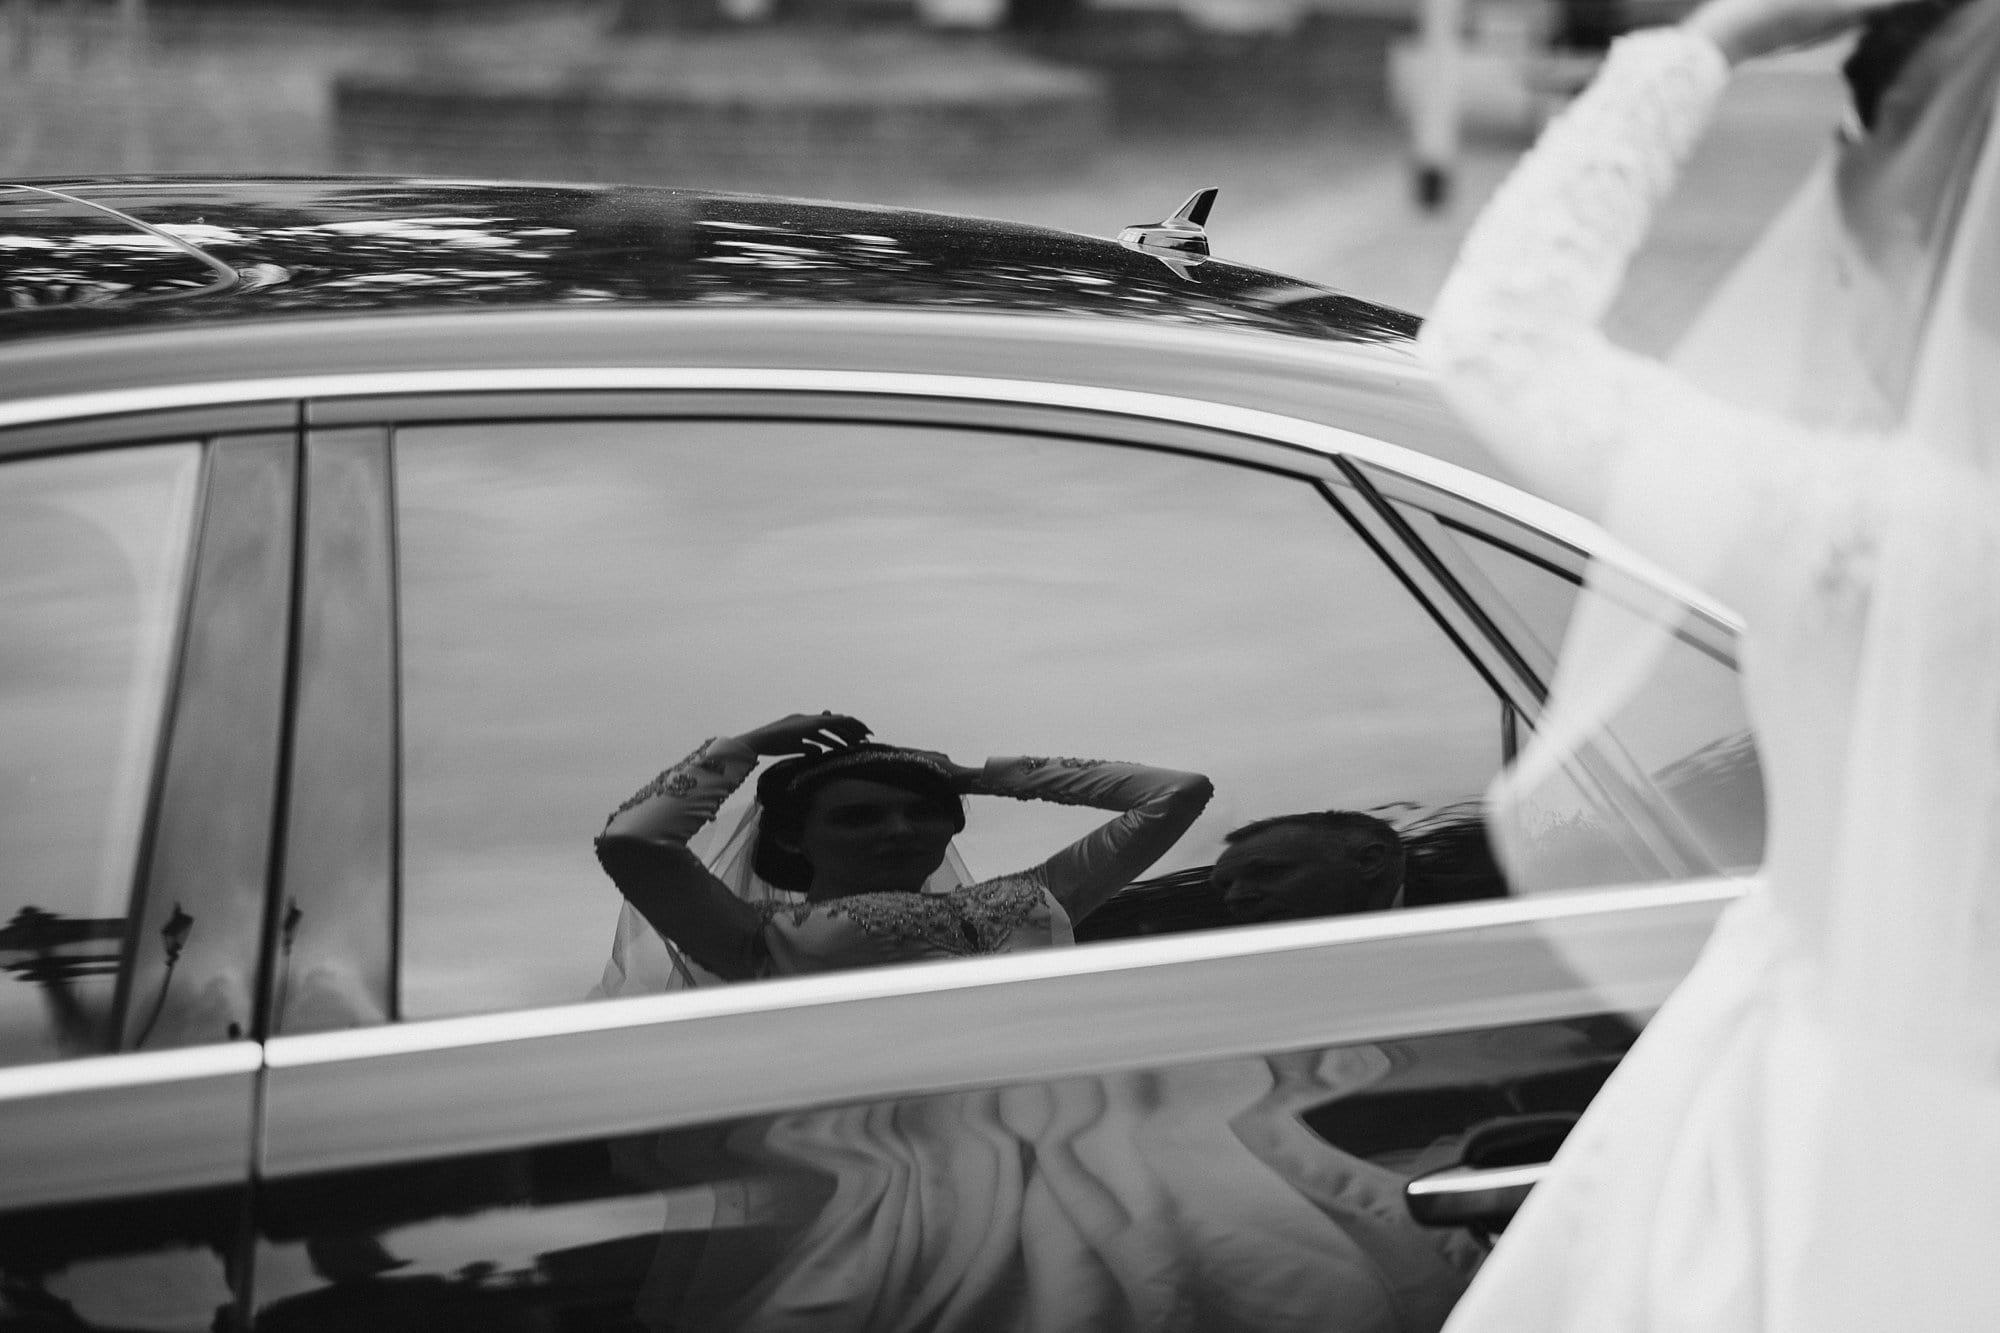 strawberry hill house wedding photographer cc 023 - Strawberry Hill House Wedding Photographer | Charlotte + Cristiano